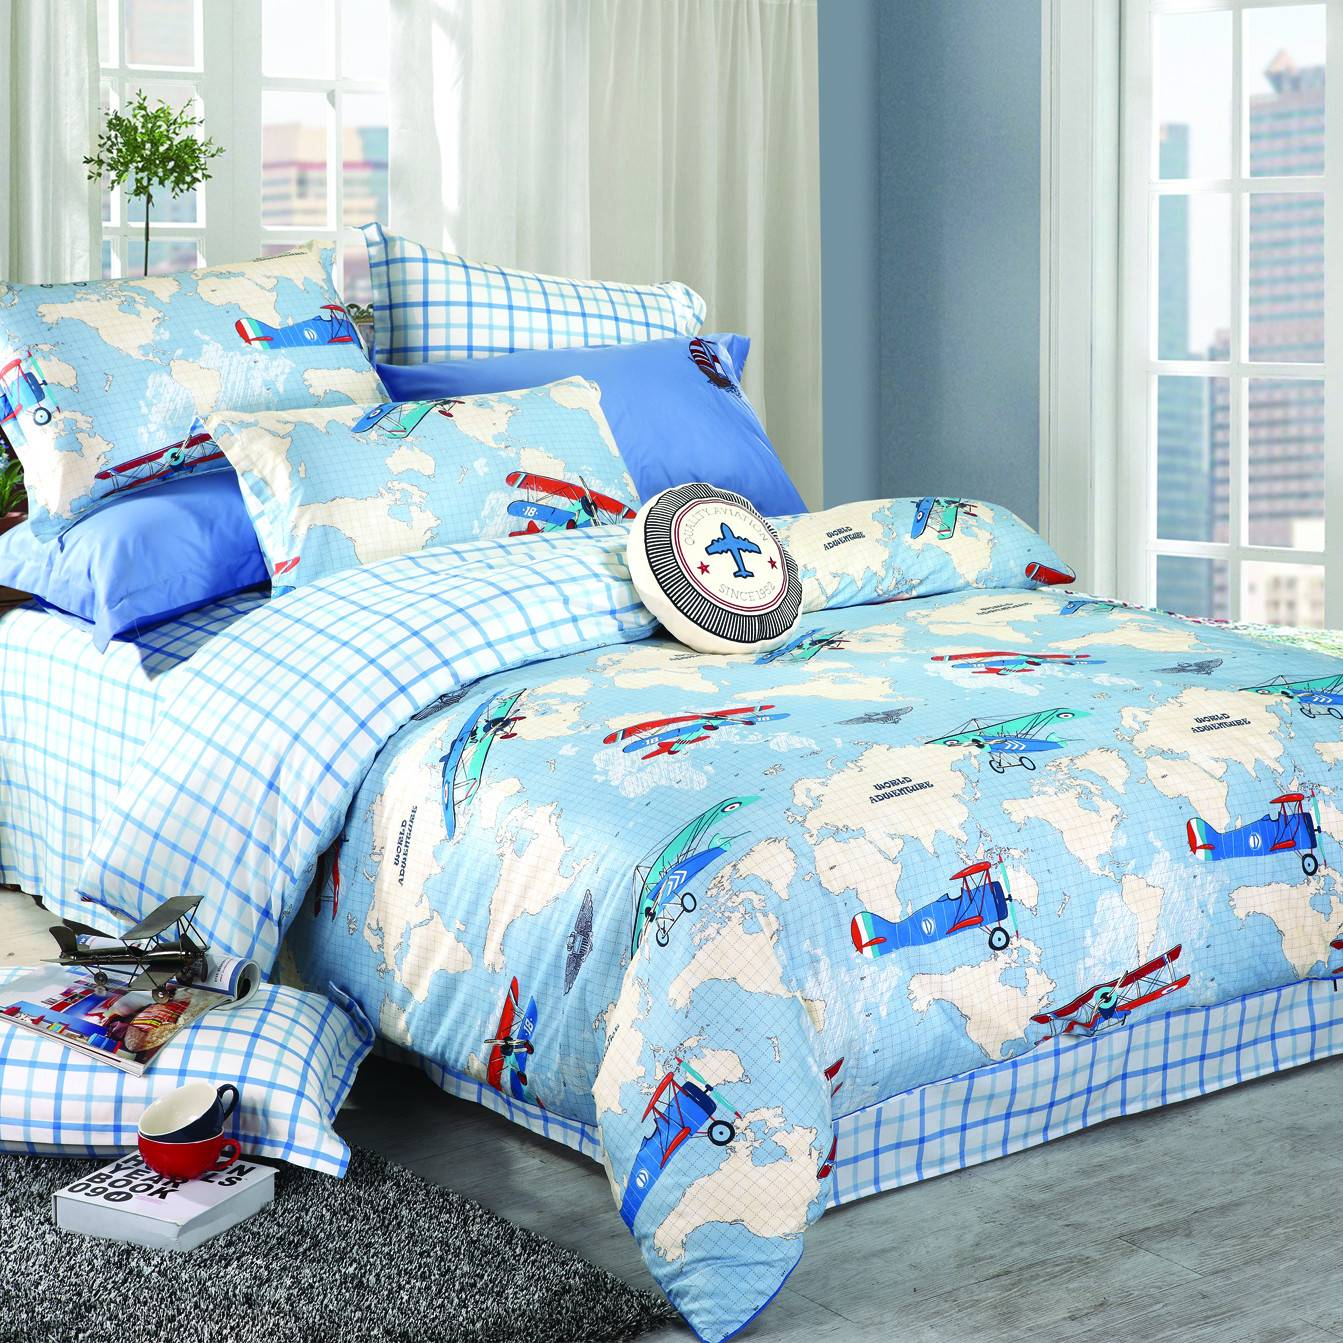 Daphne World Adventure Theme Kids Printed Cotton Bed 6817 Kids Bedding Set image1